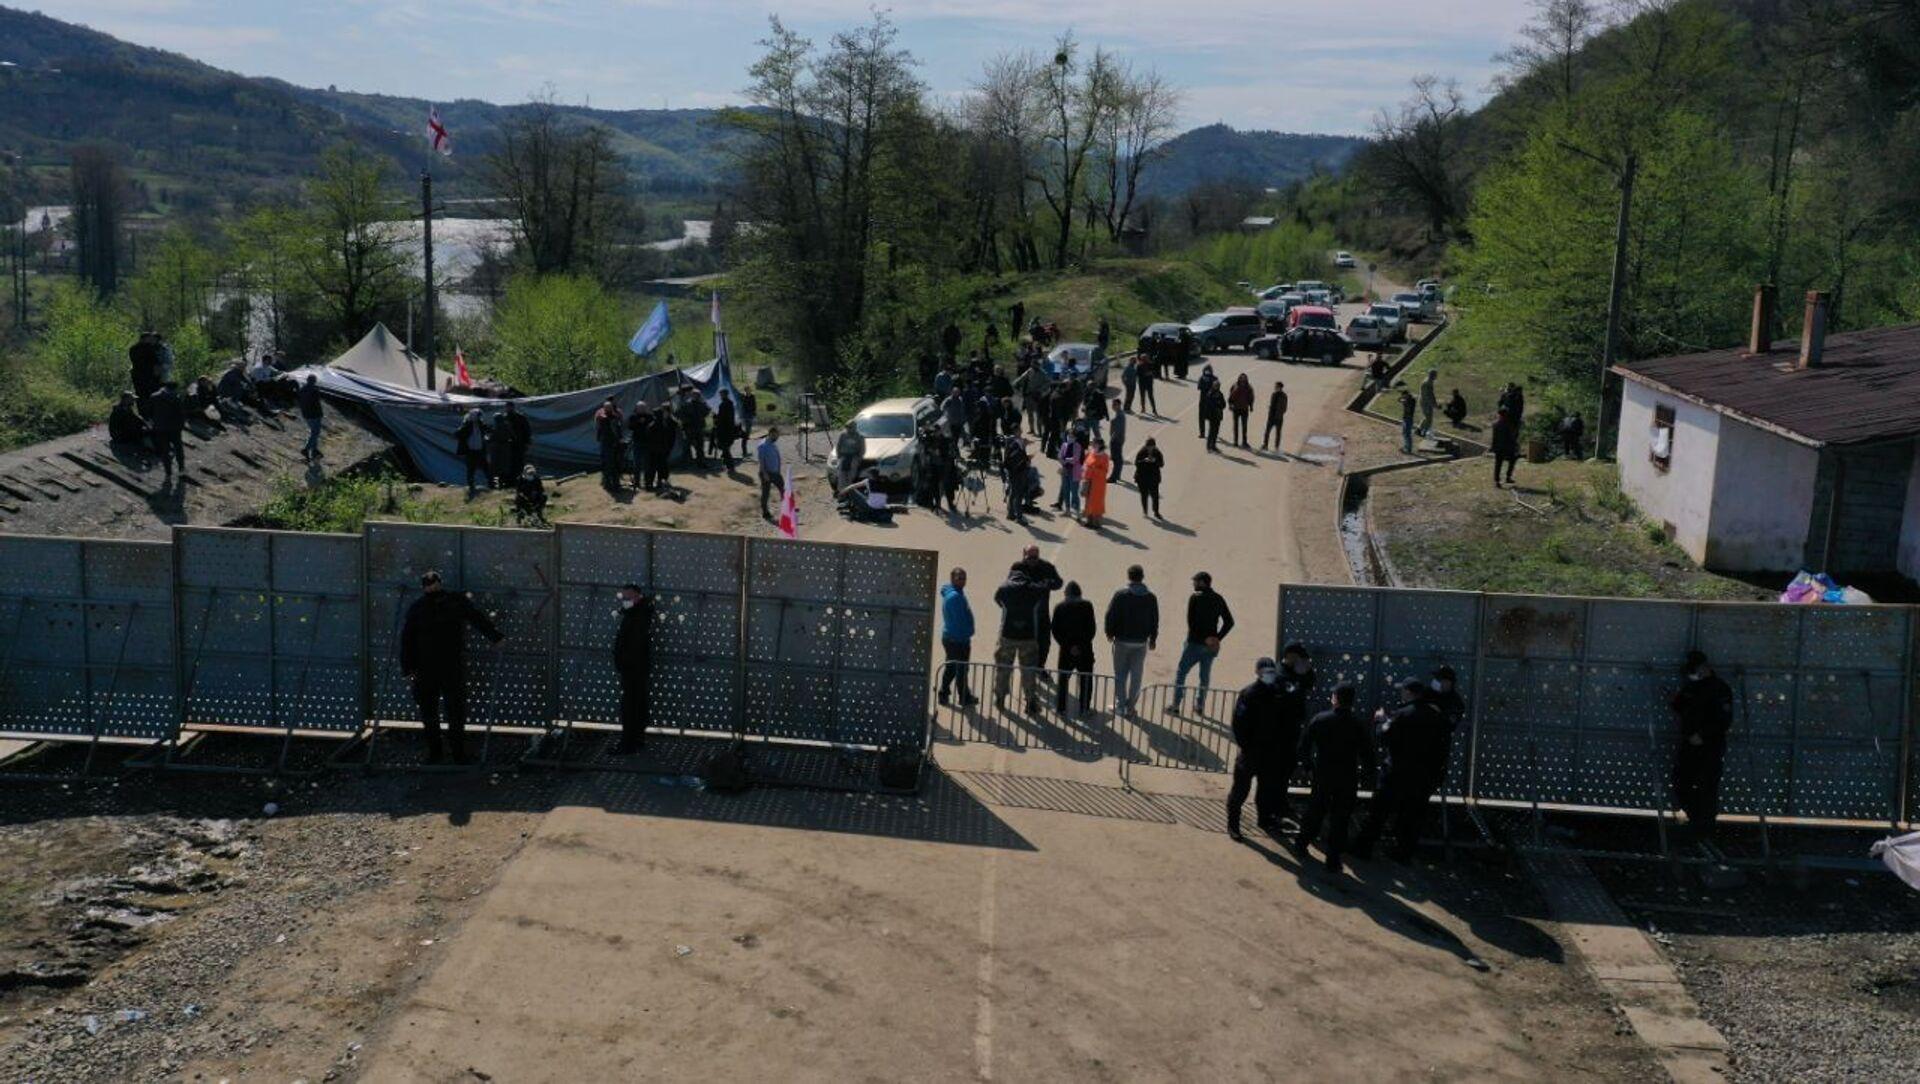 Акция протеста на месте строительства Намахвани ГЭС 15 апреля 2021 года - Sputnik Грузия, 1920, 15.04.2021